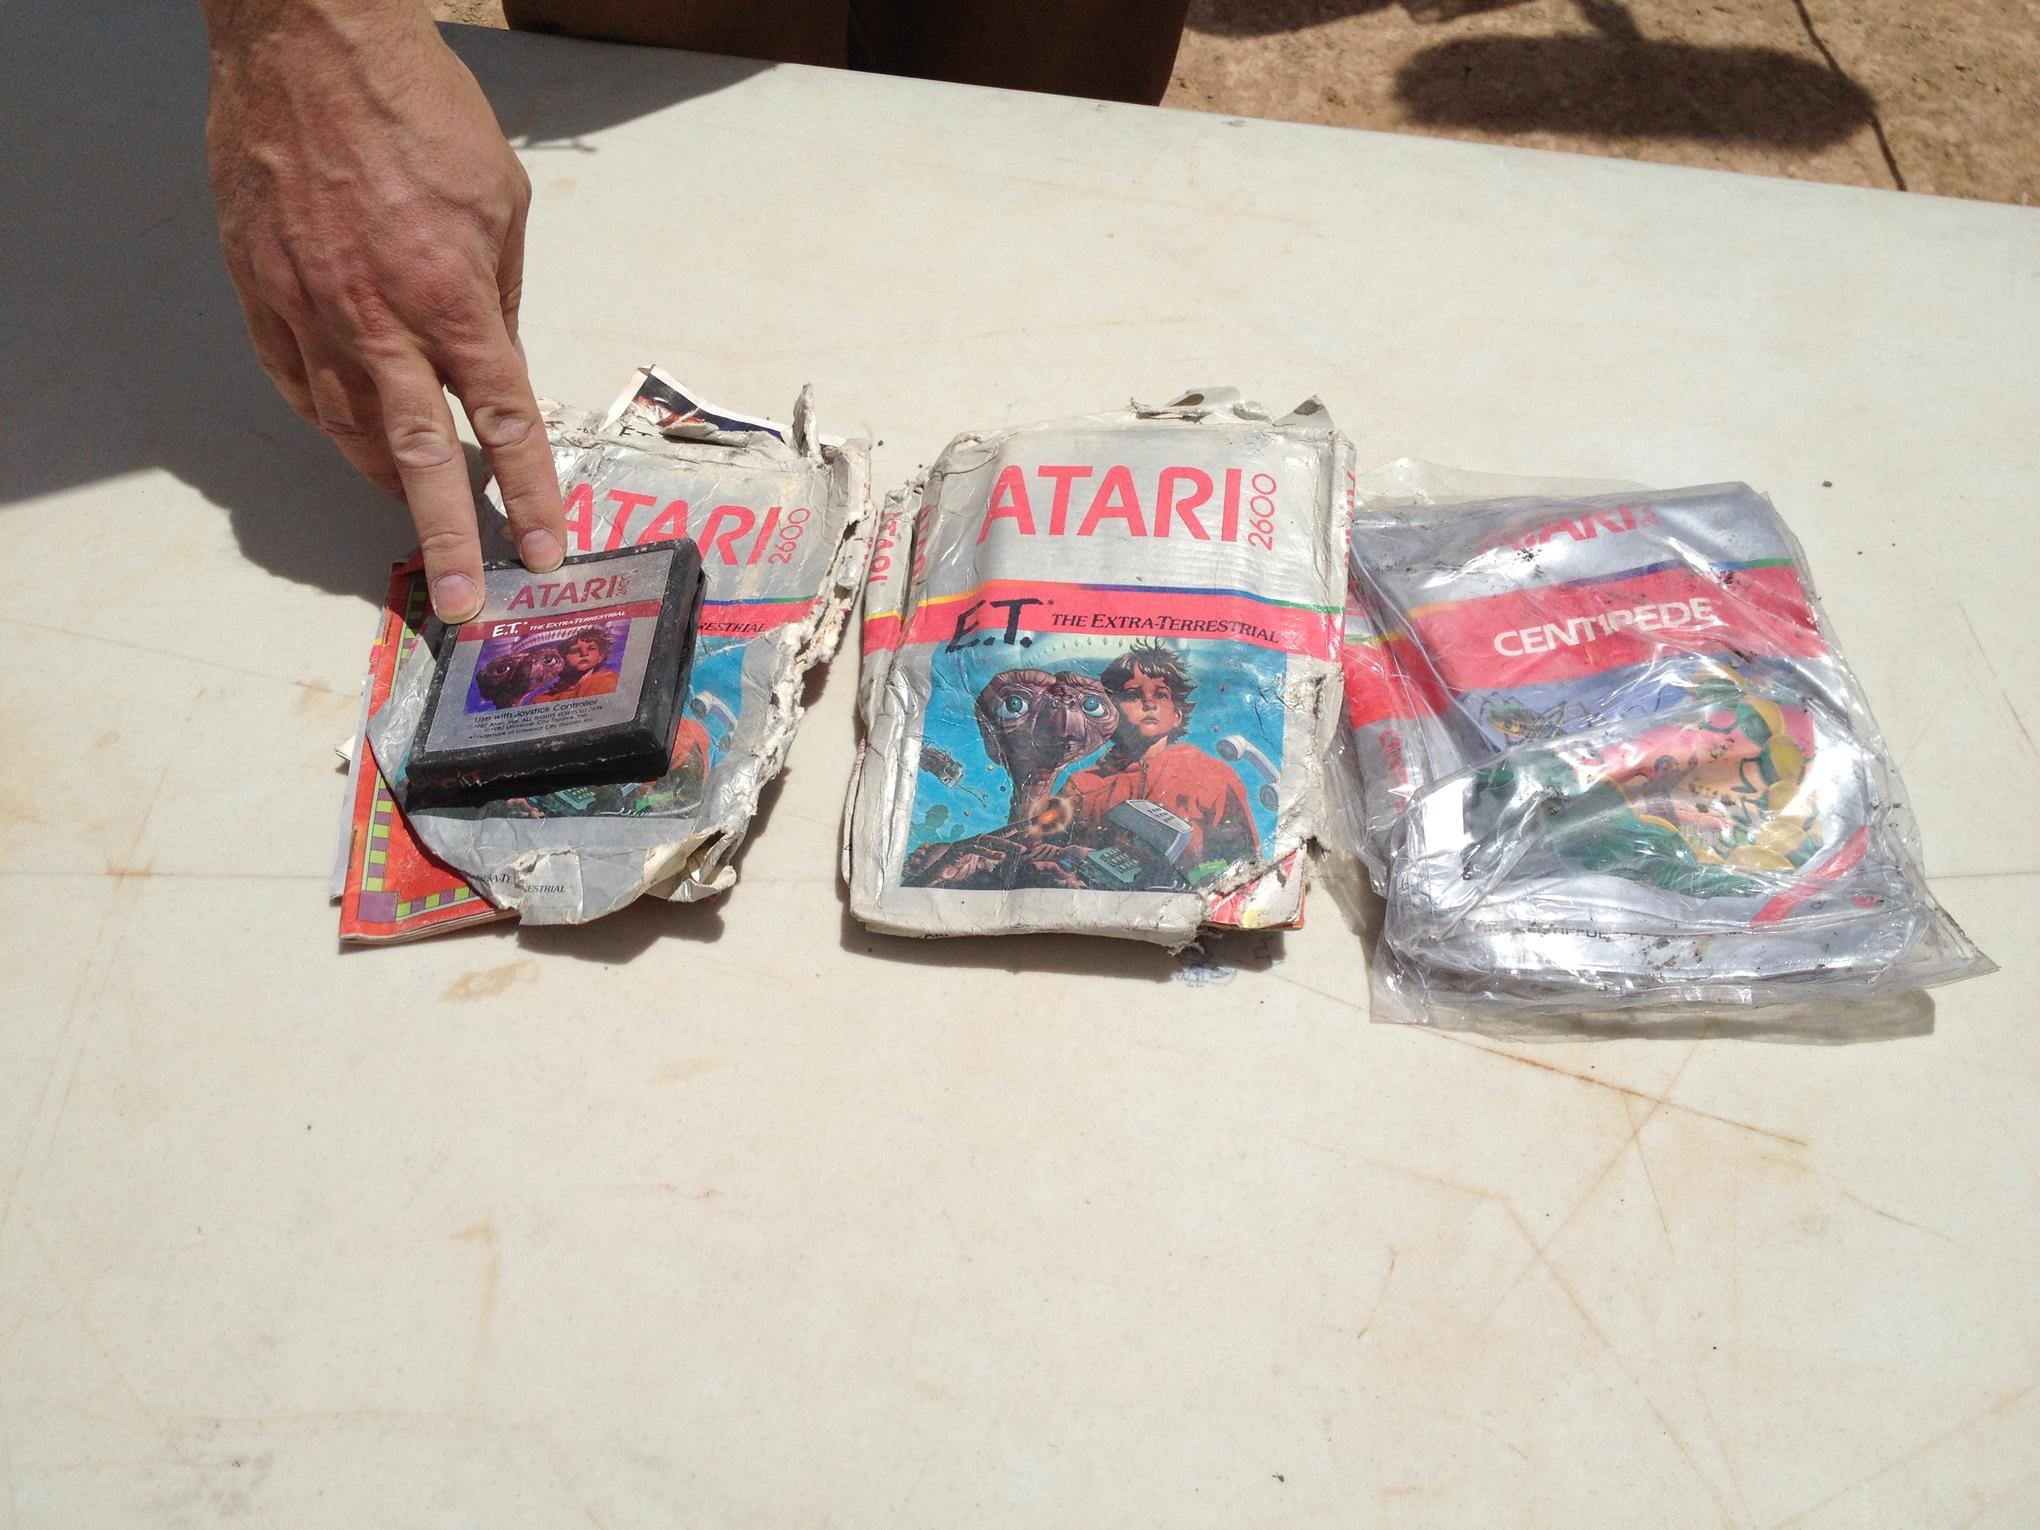 The E.T.-Atari landfill documentary premieres Nov. 20